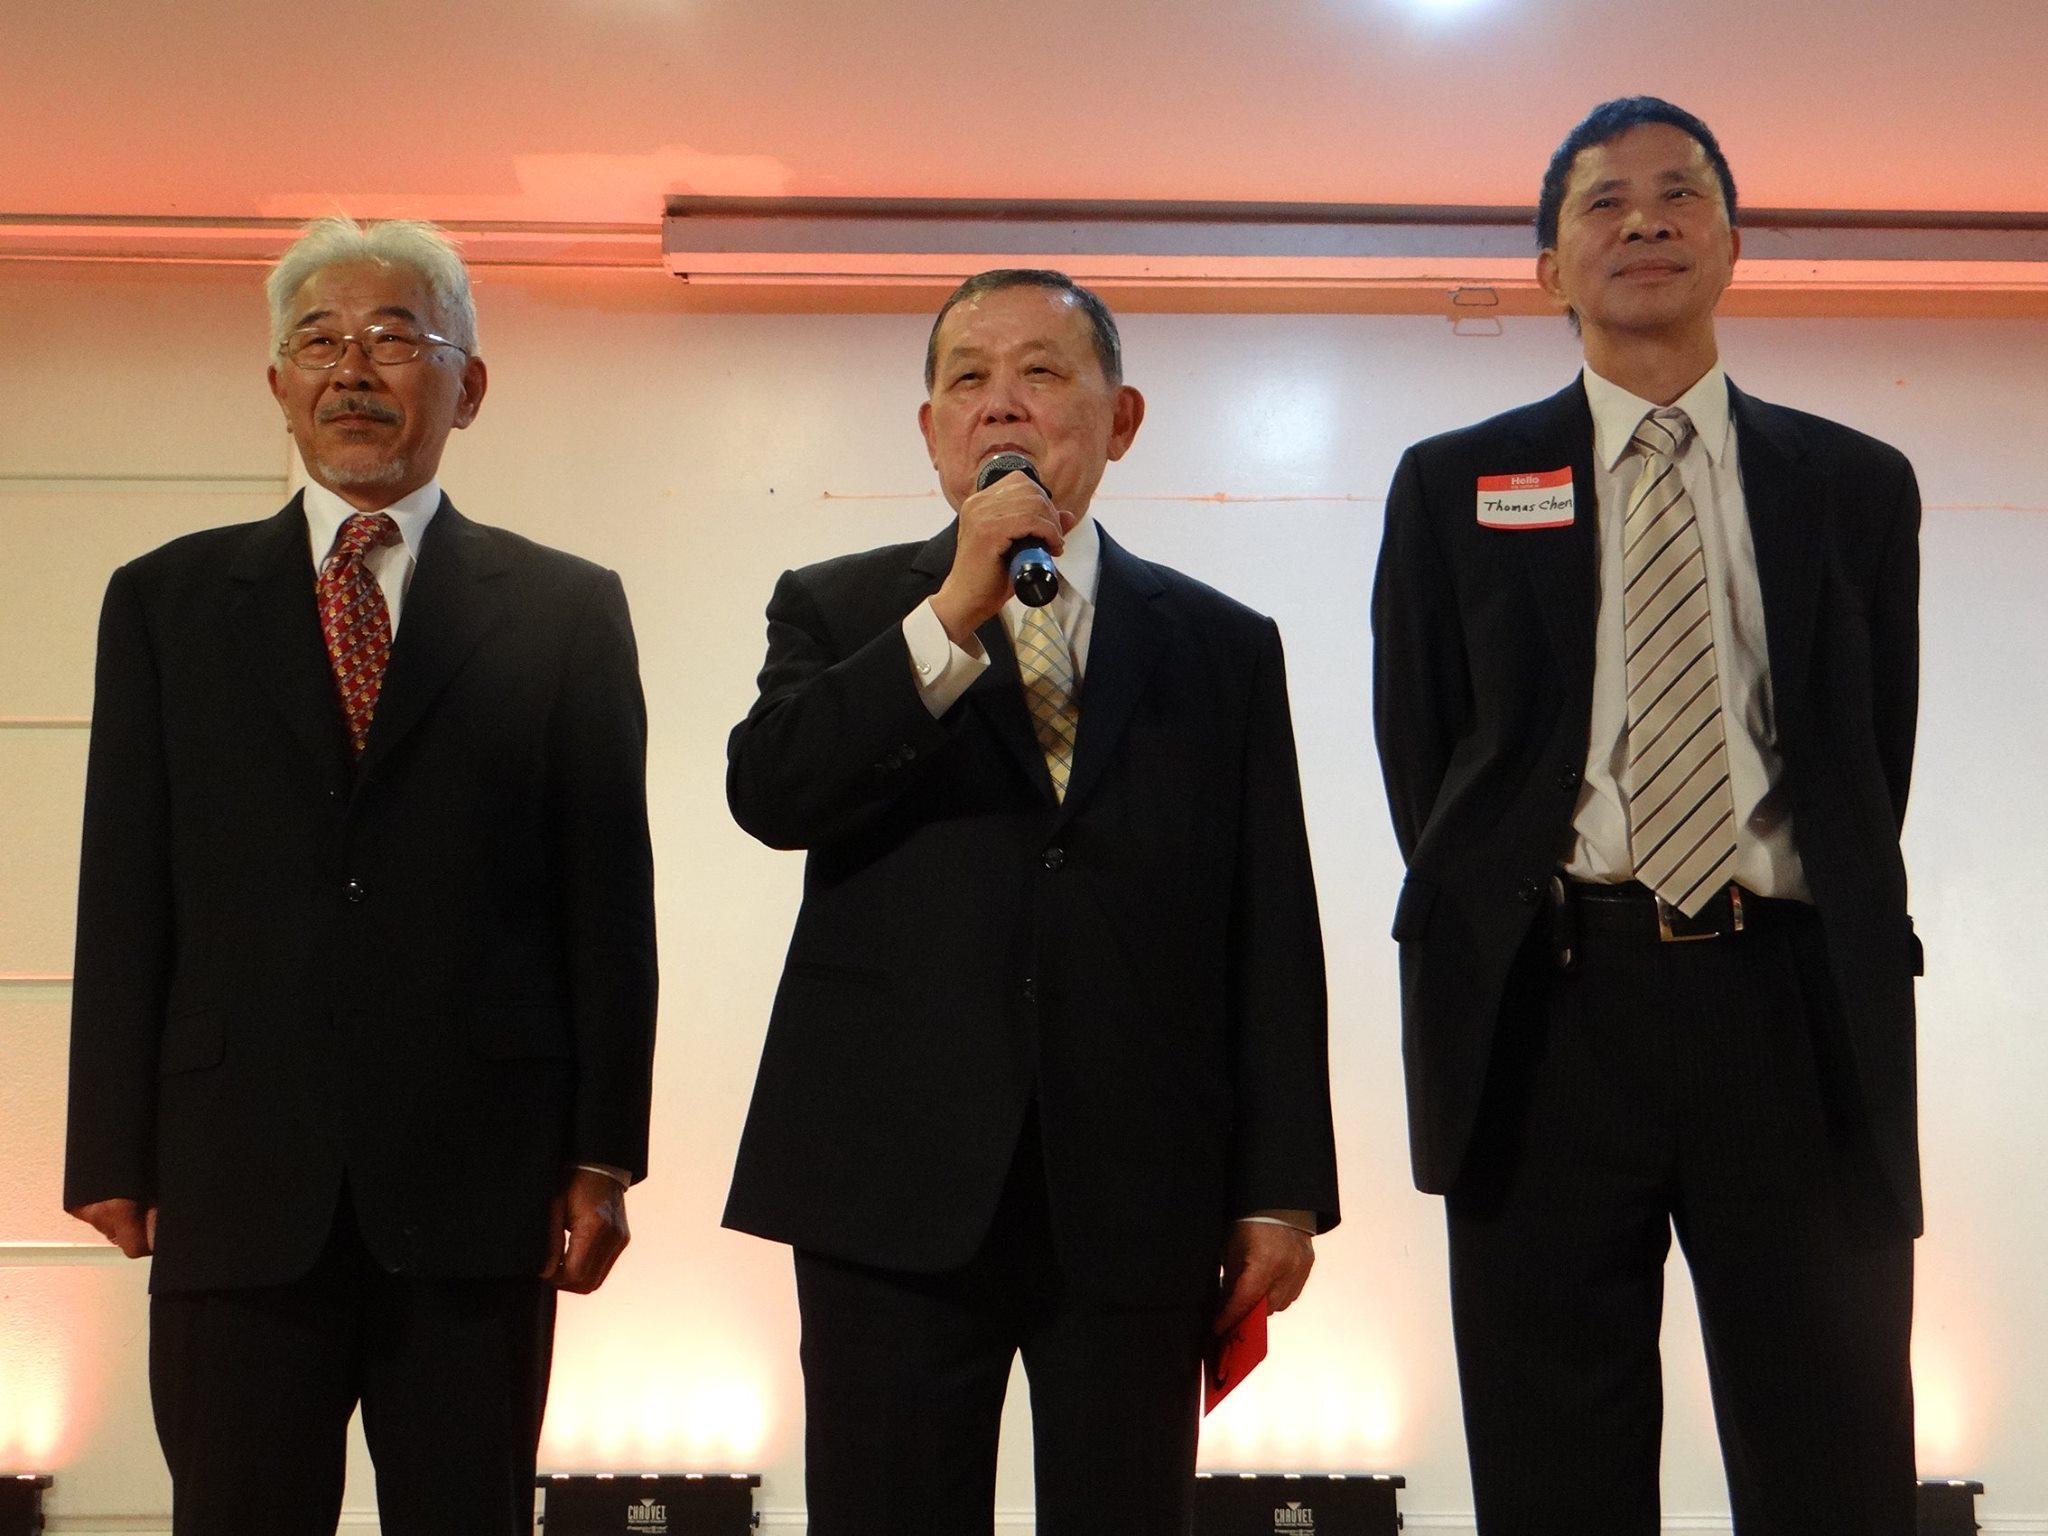 TAAC 2015 all three founders.jpg